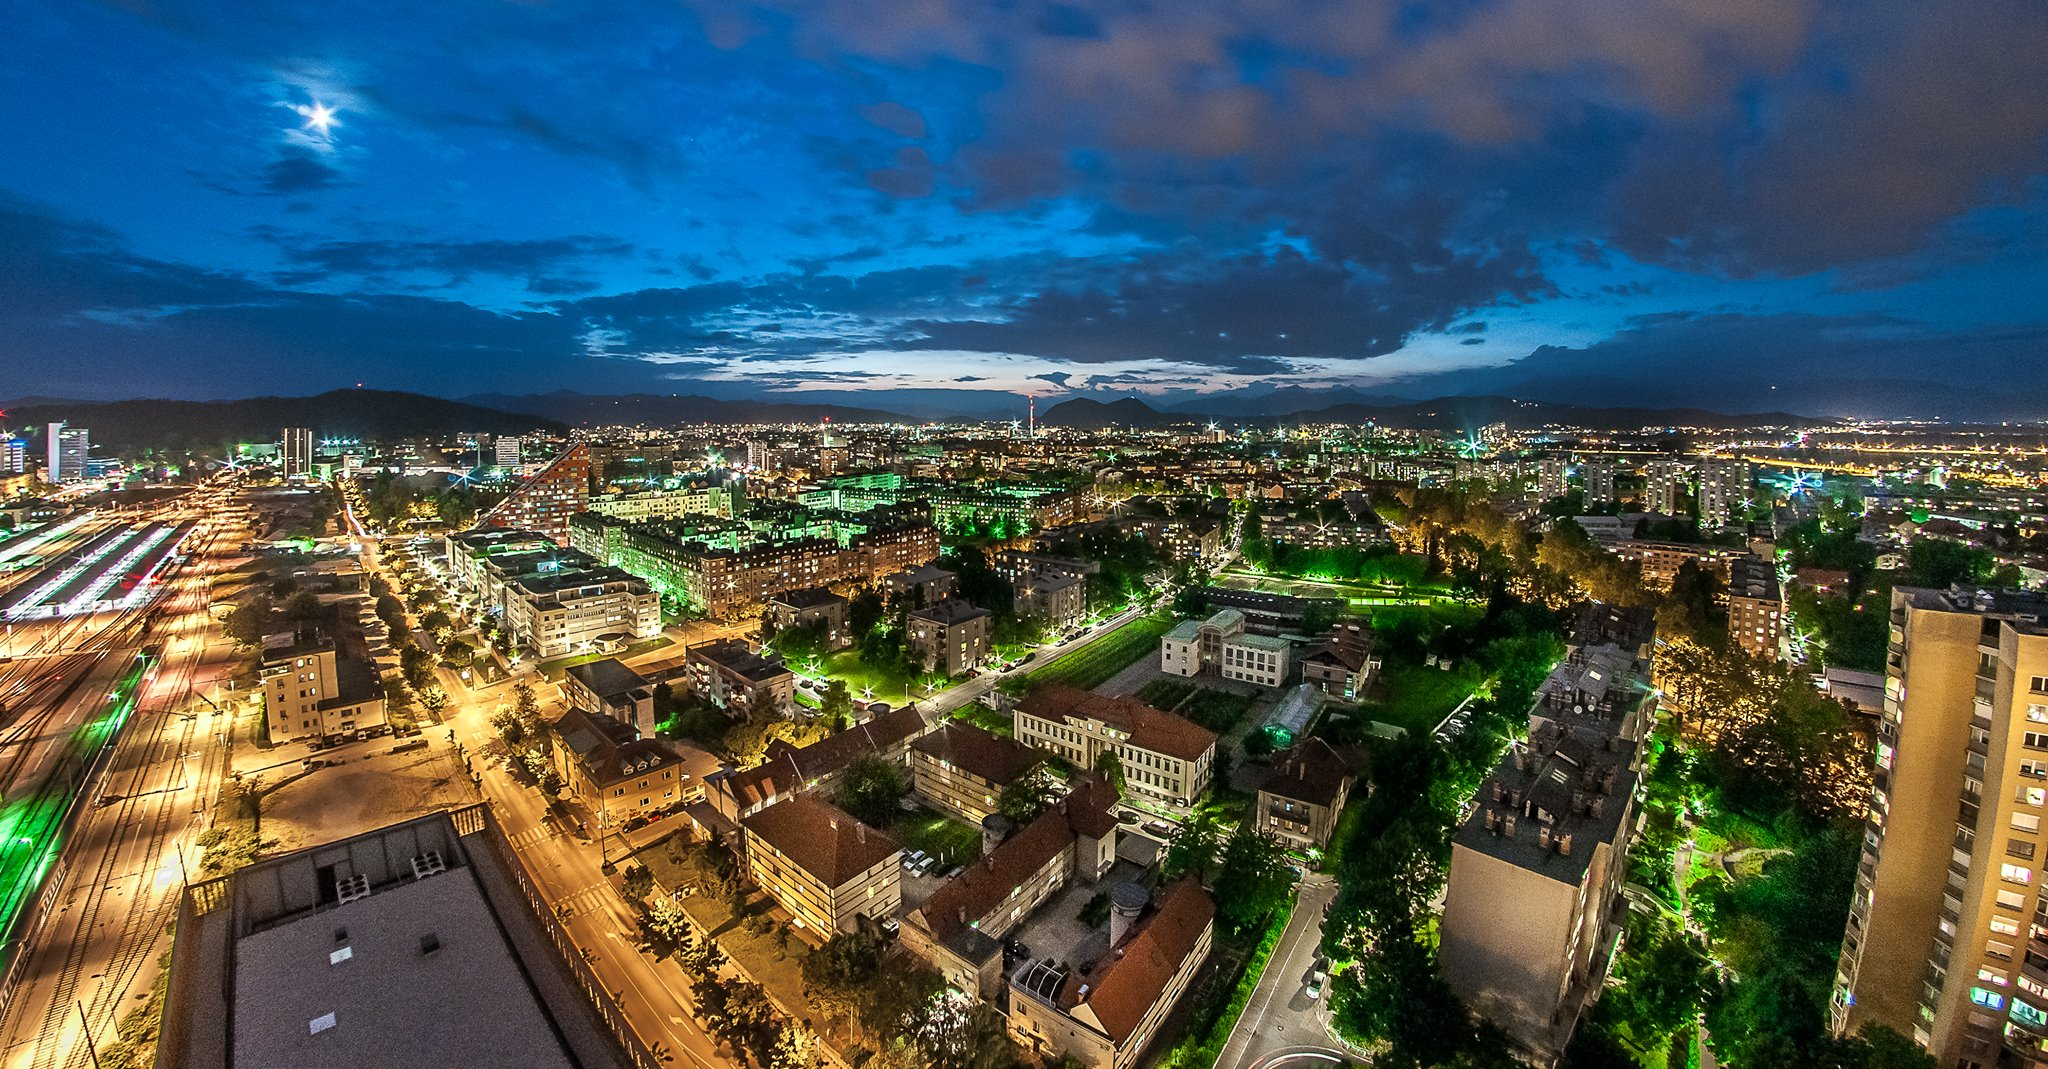 Ljubljana was selected as Green Capital of Europe 2016. Photo by Matic Kremžar